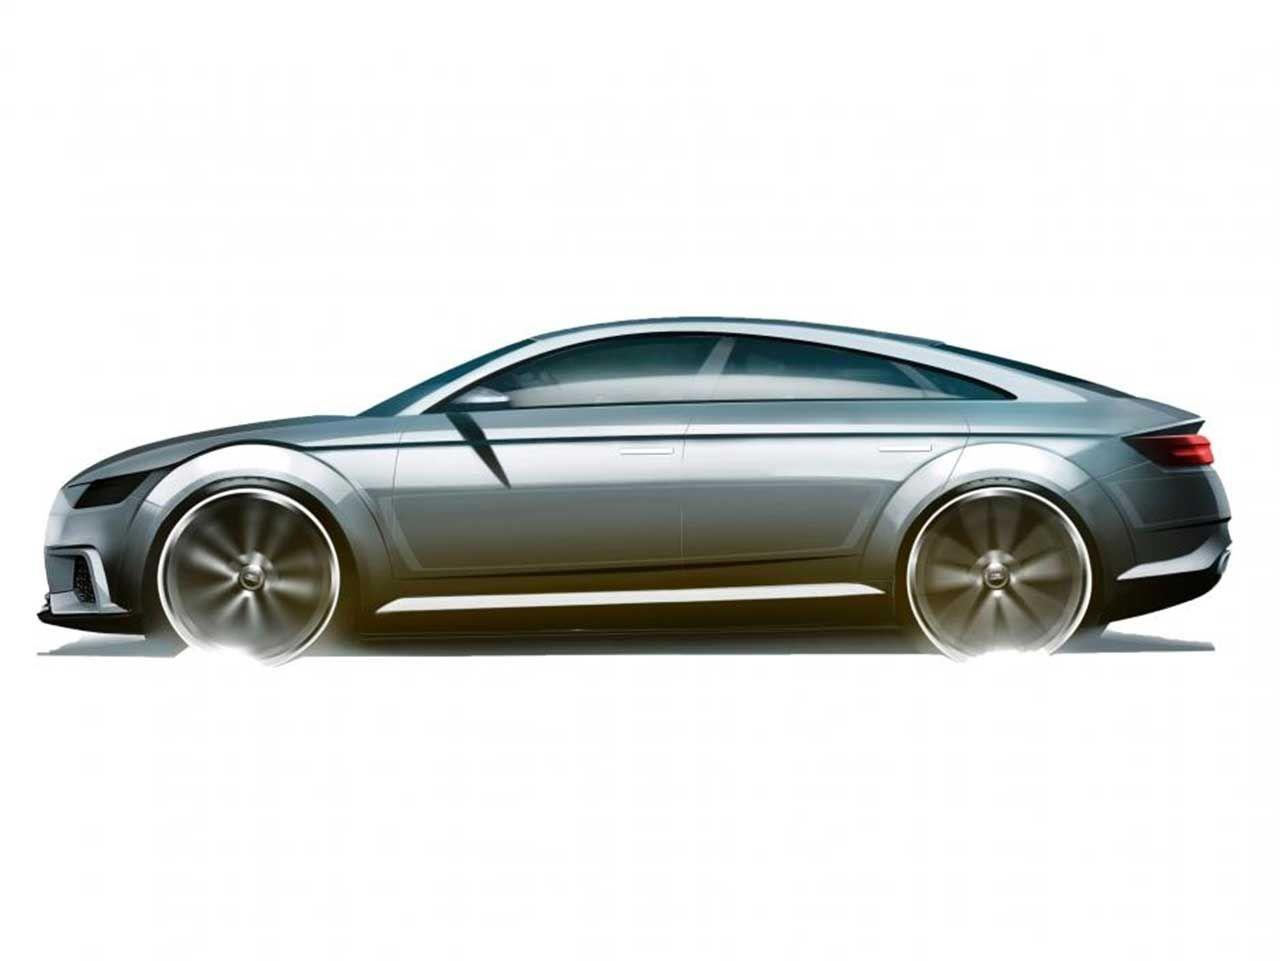 Audi TT Sportback Concept leaks ahead of Paris debut  http://www.4wheelsnews.com/audi-tt-sportback-concept-leaks-ahead-of-paris-debut/  #audi #ttsportback #mondialauto